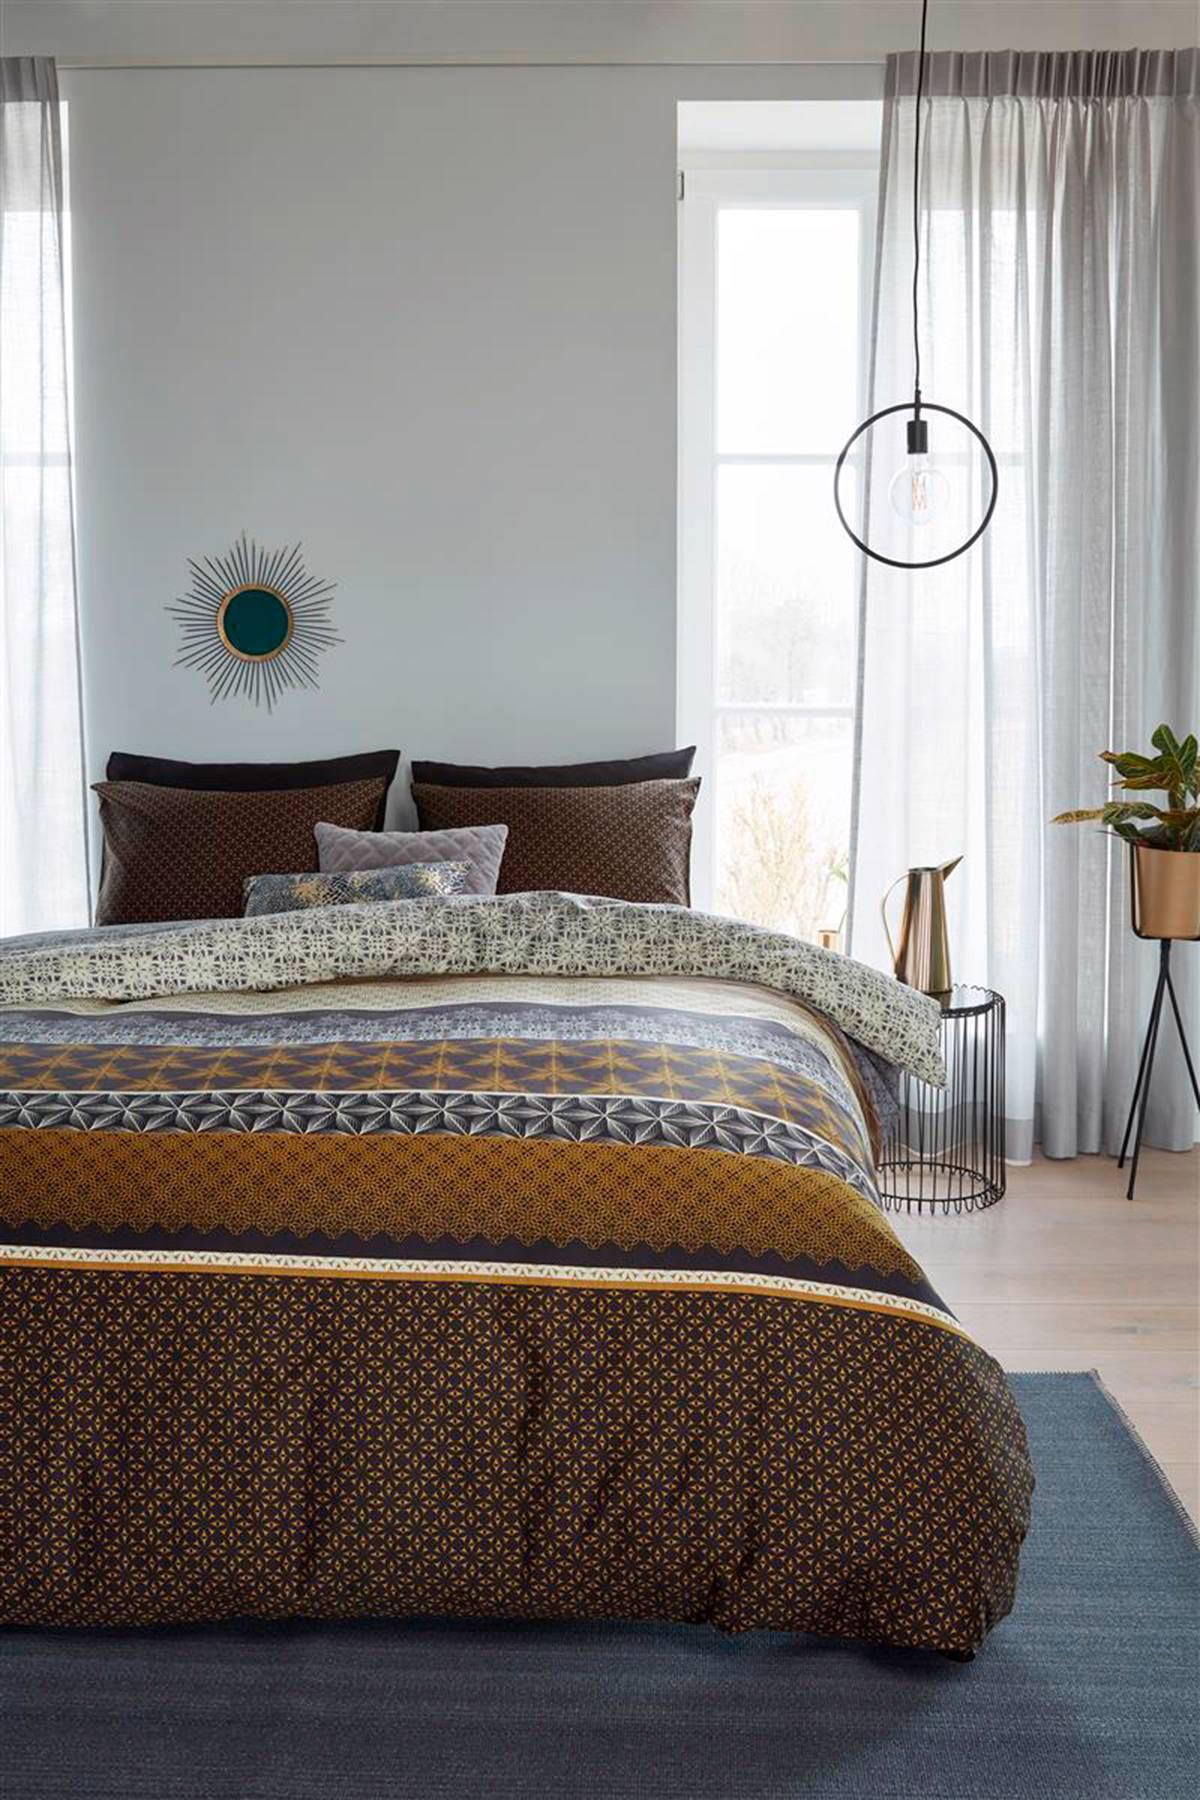 beddinghouse katoensatijnen dekbedovertrek lits jumeaux goud